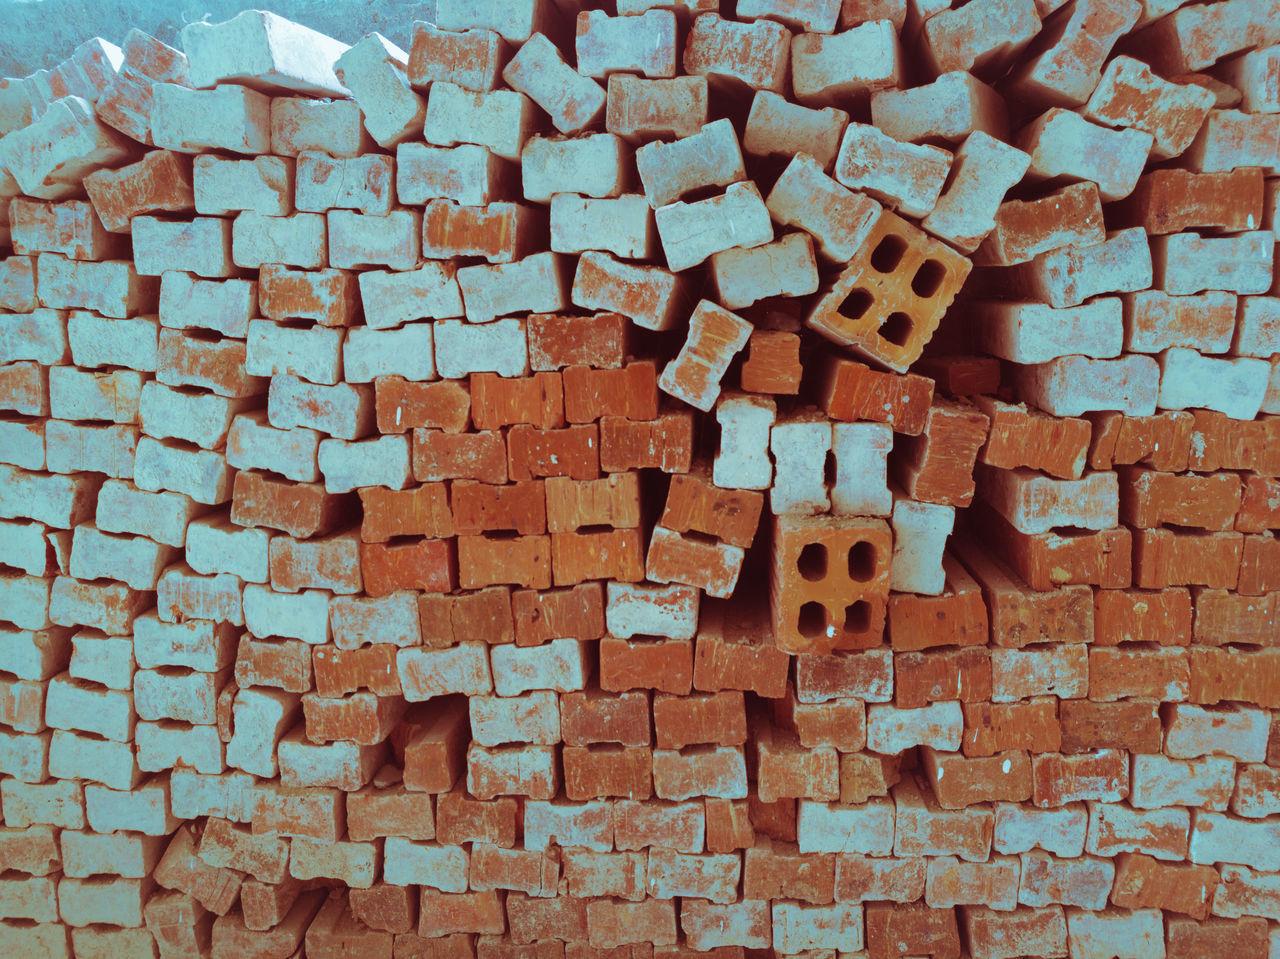 Background Backgrounds Brick Bricks Brickwall Redbricks Redbrickwall Wall Wallpaper